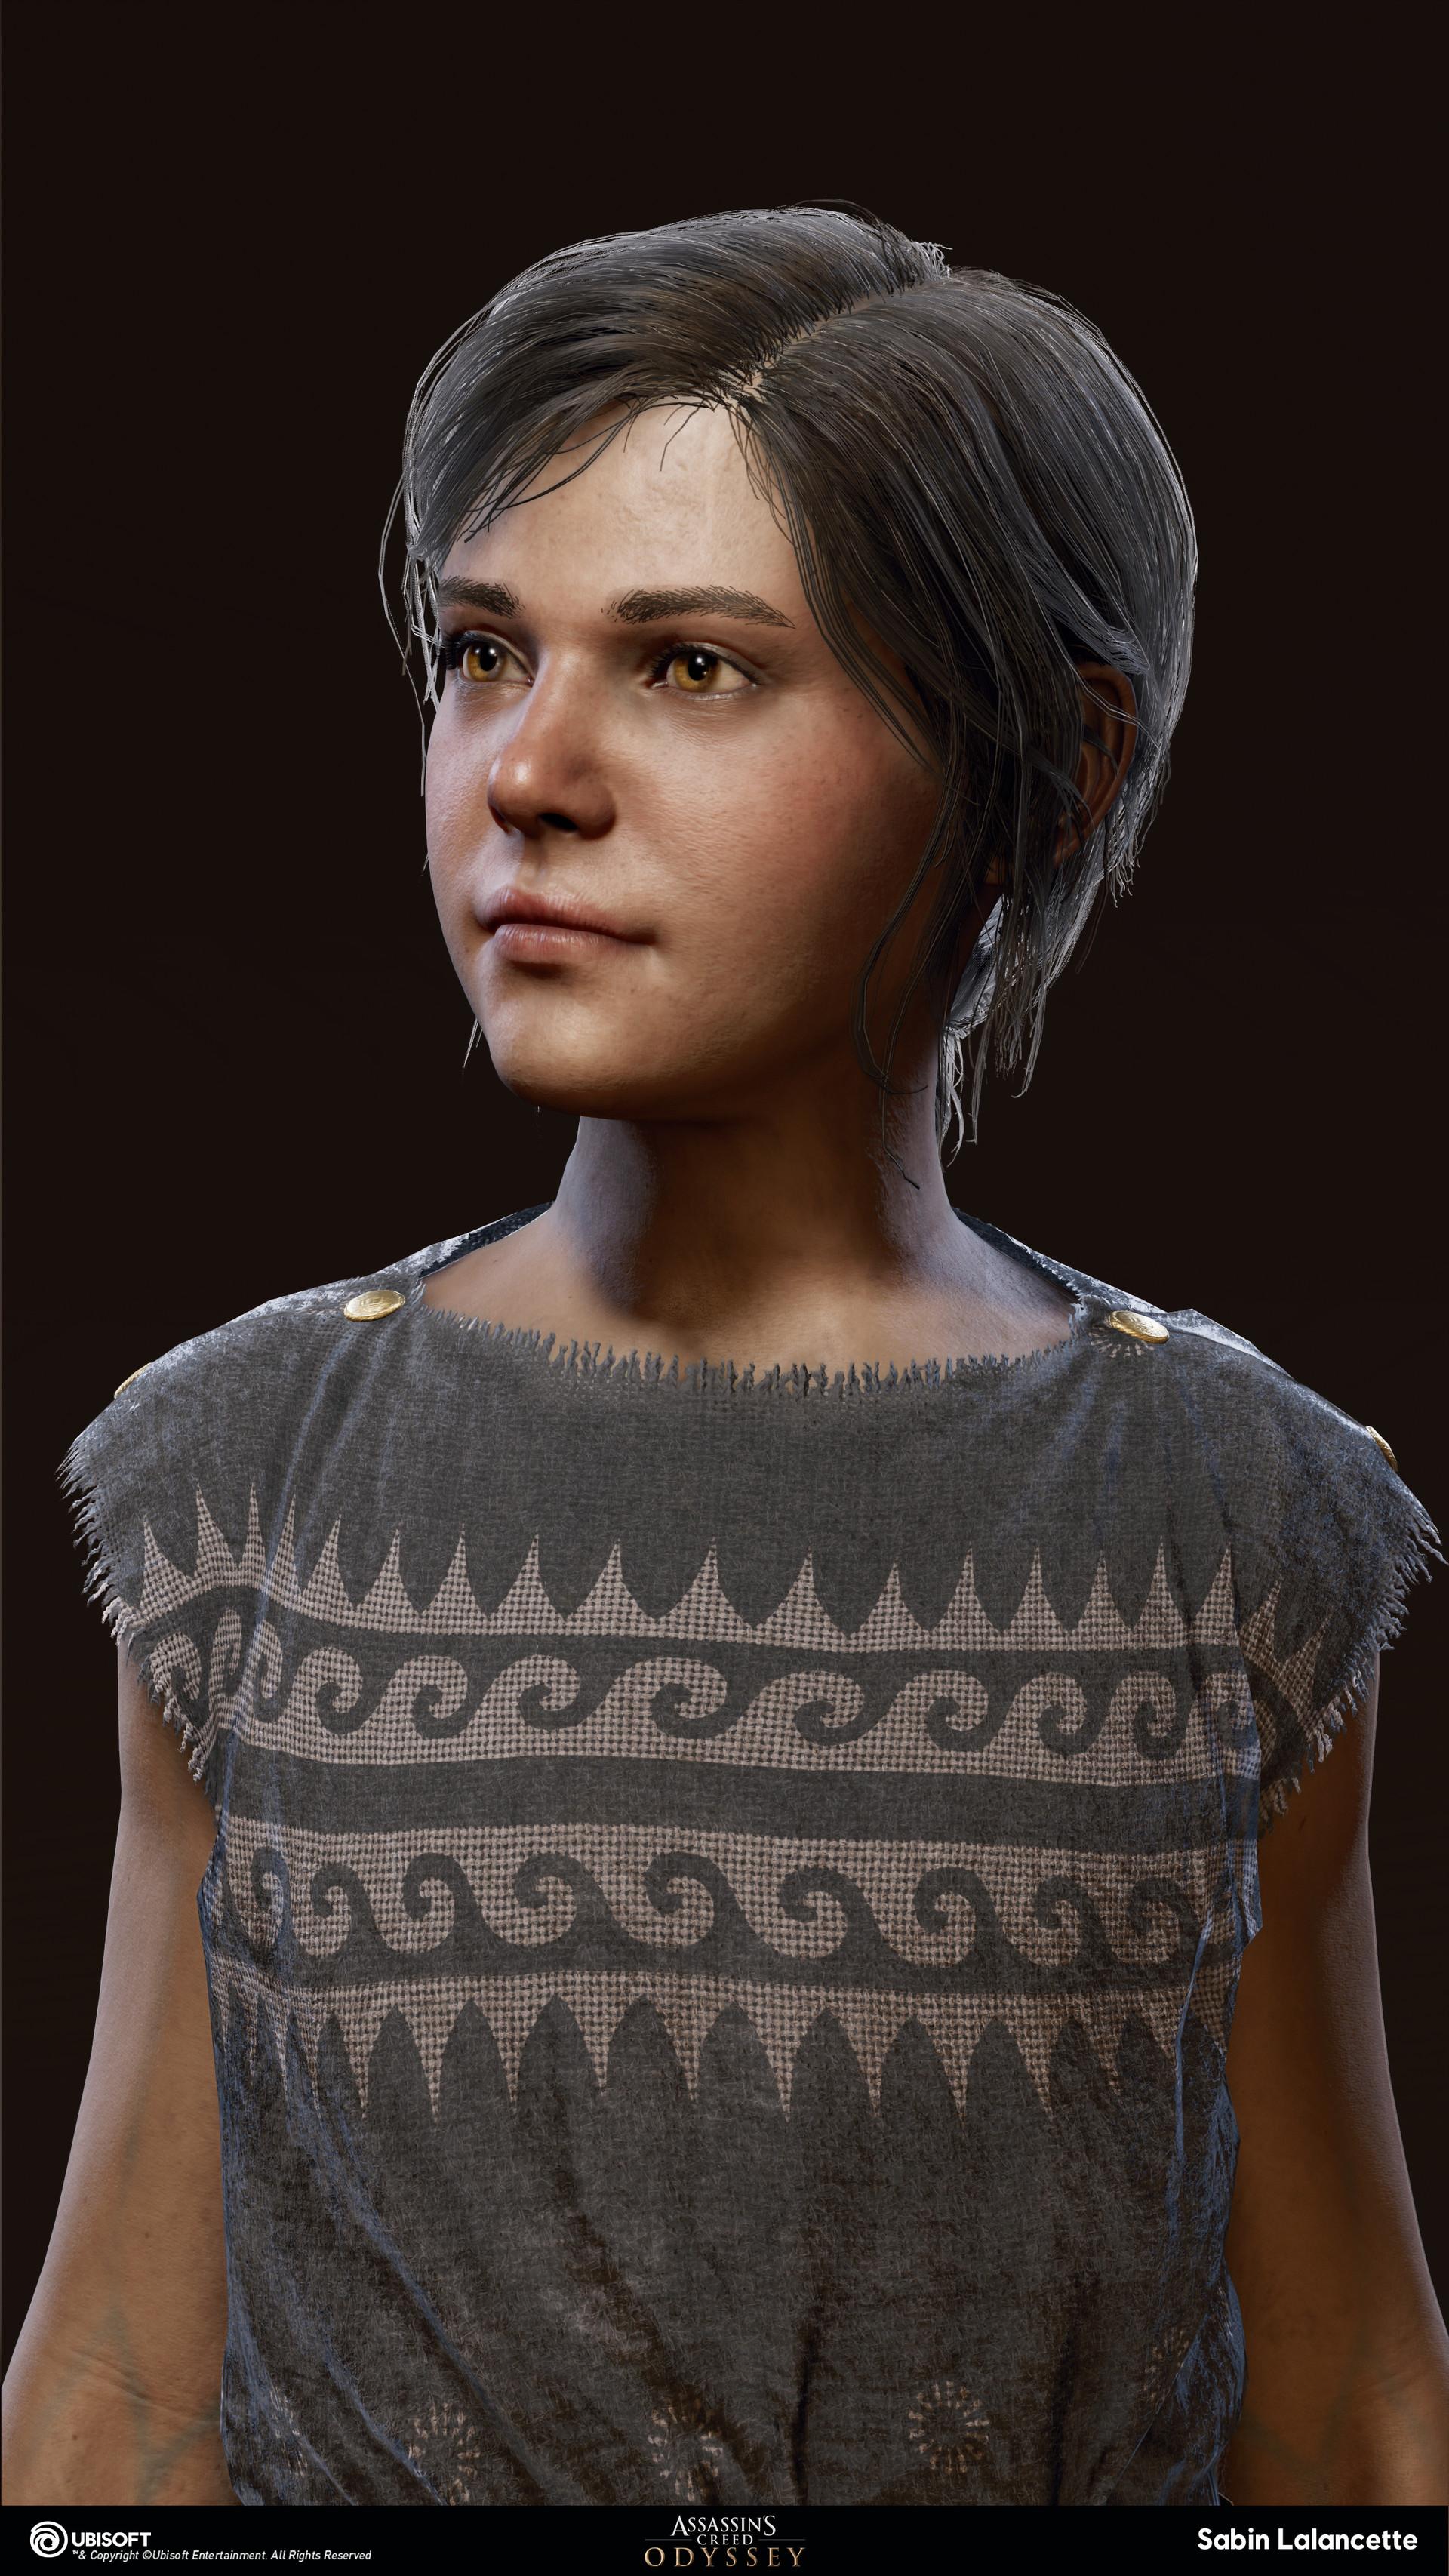 Sabin lalancette artblast fullsize hex portrait young kassandra slalancette